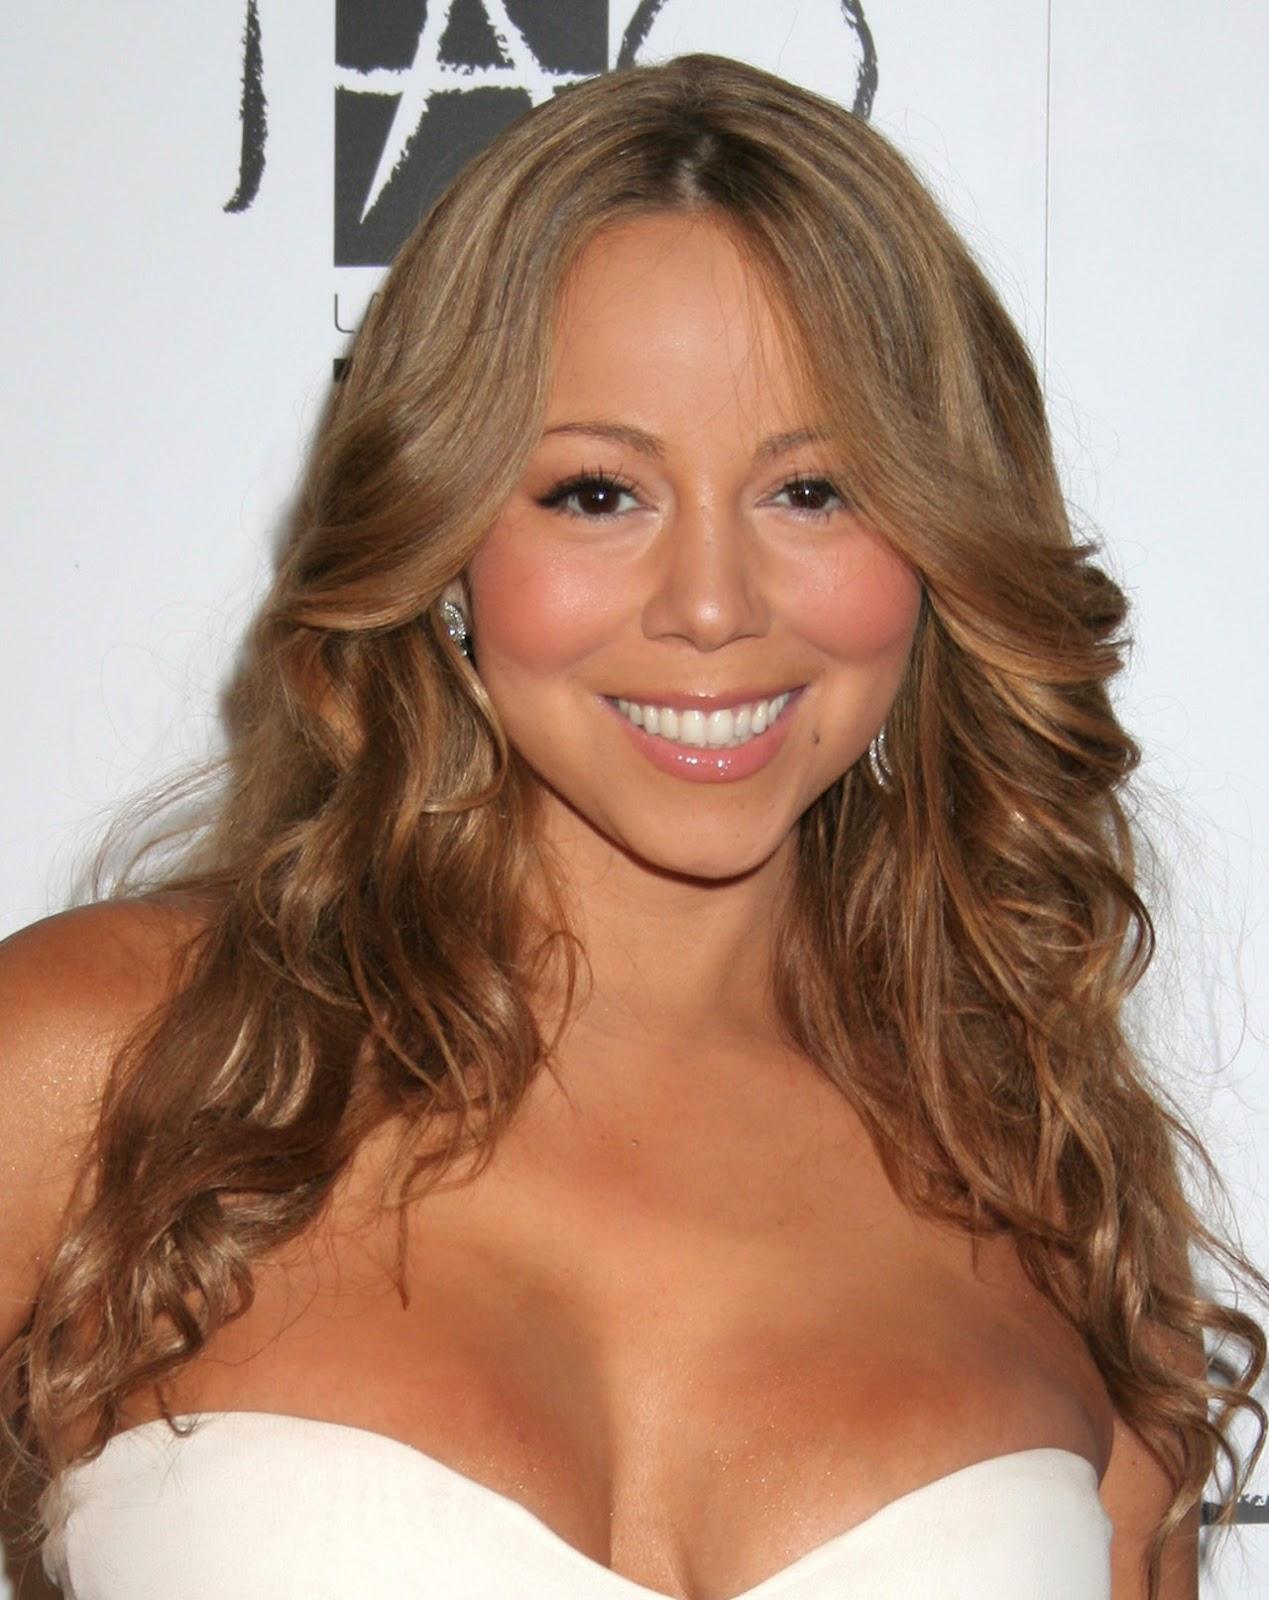 Mariah Carey Mariah Carey Cleavage Pics-9814